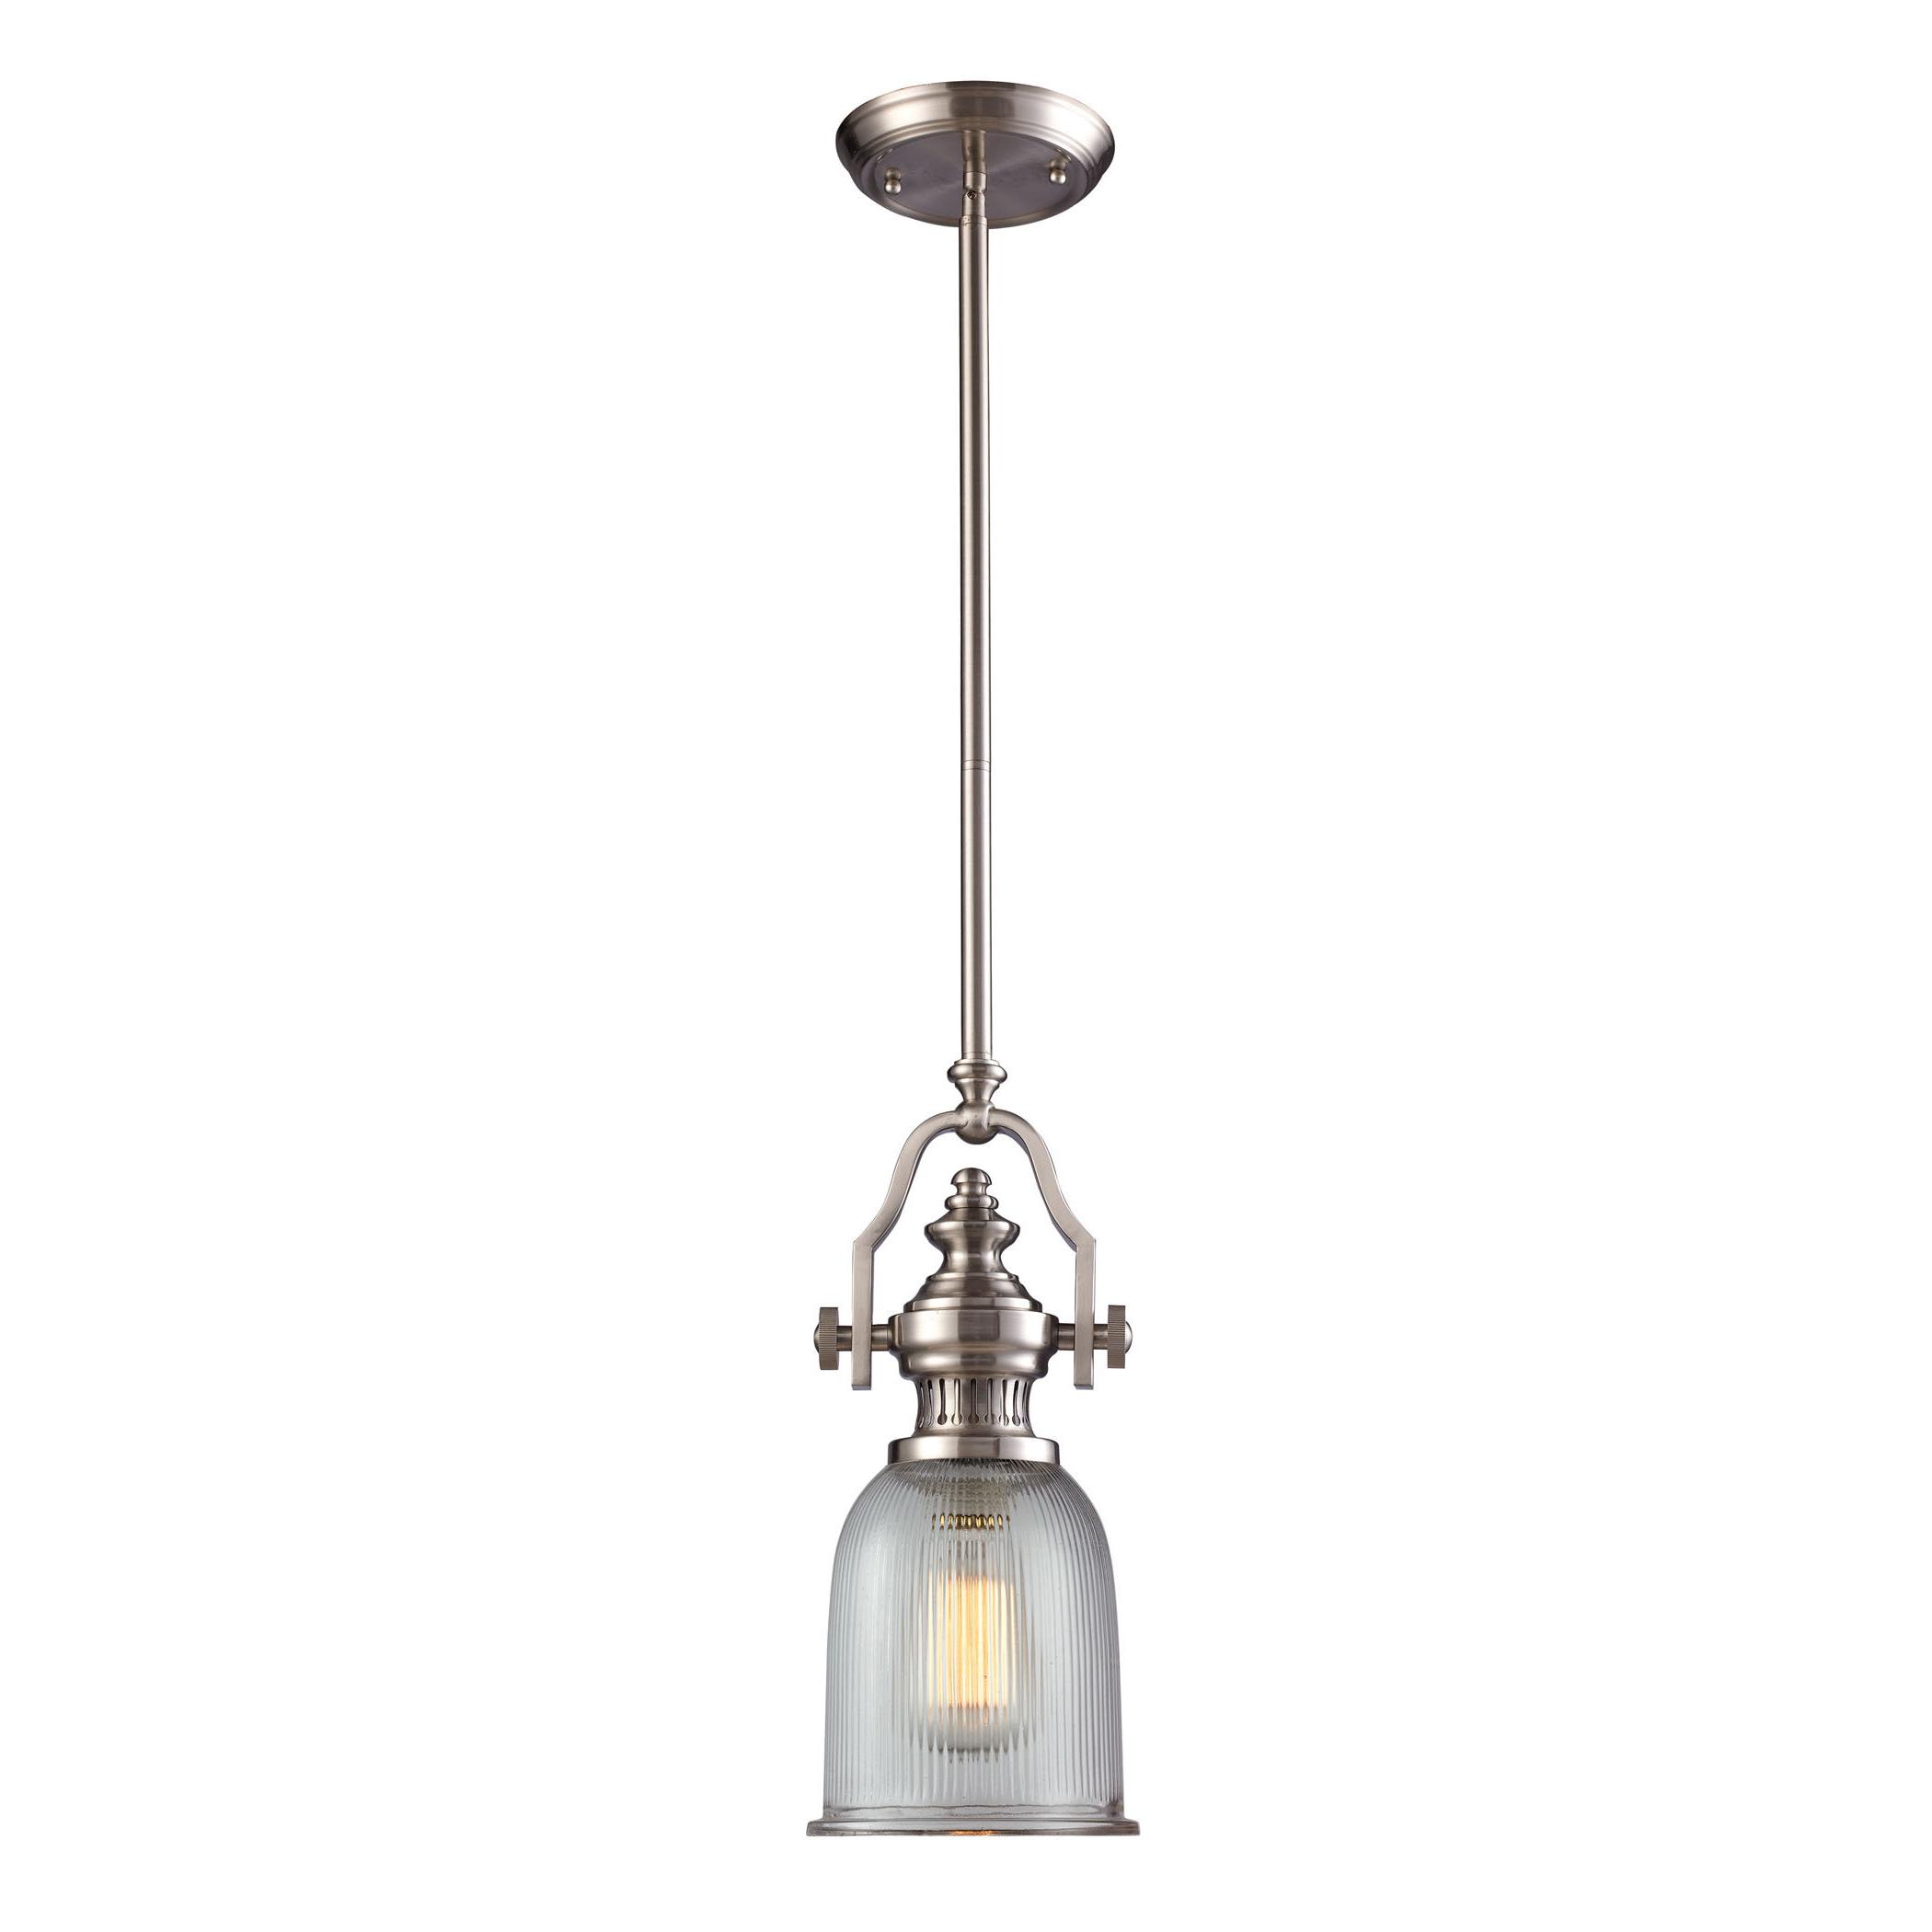 Birch Lane™ Heritage Erico 1 Light Single Bell Pendant In Current Grullon Scroll 1 Light Single Bell Pendants (View 2 of 20)